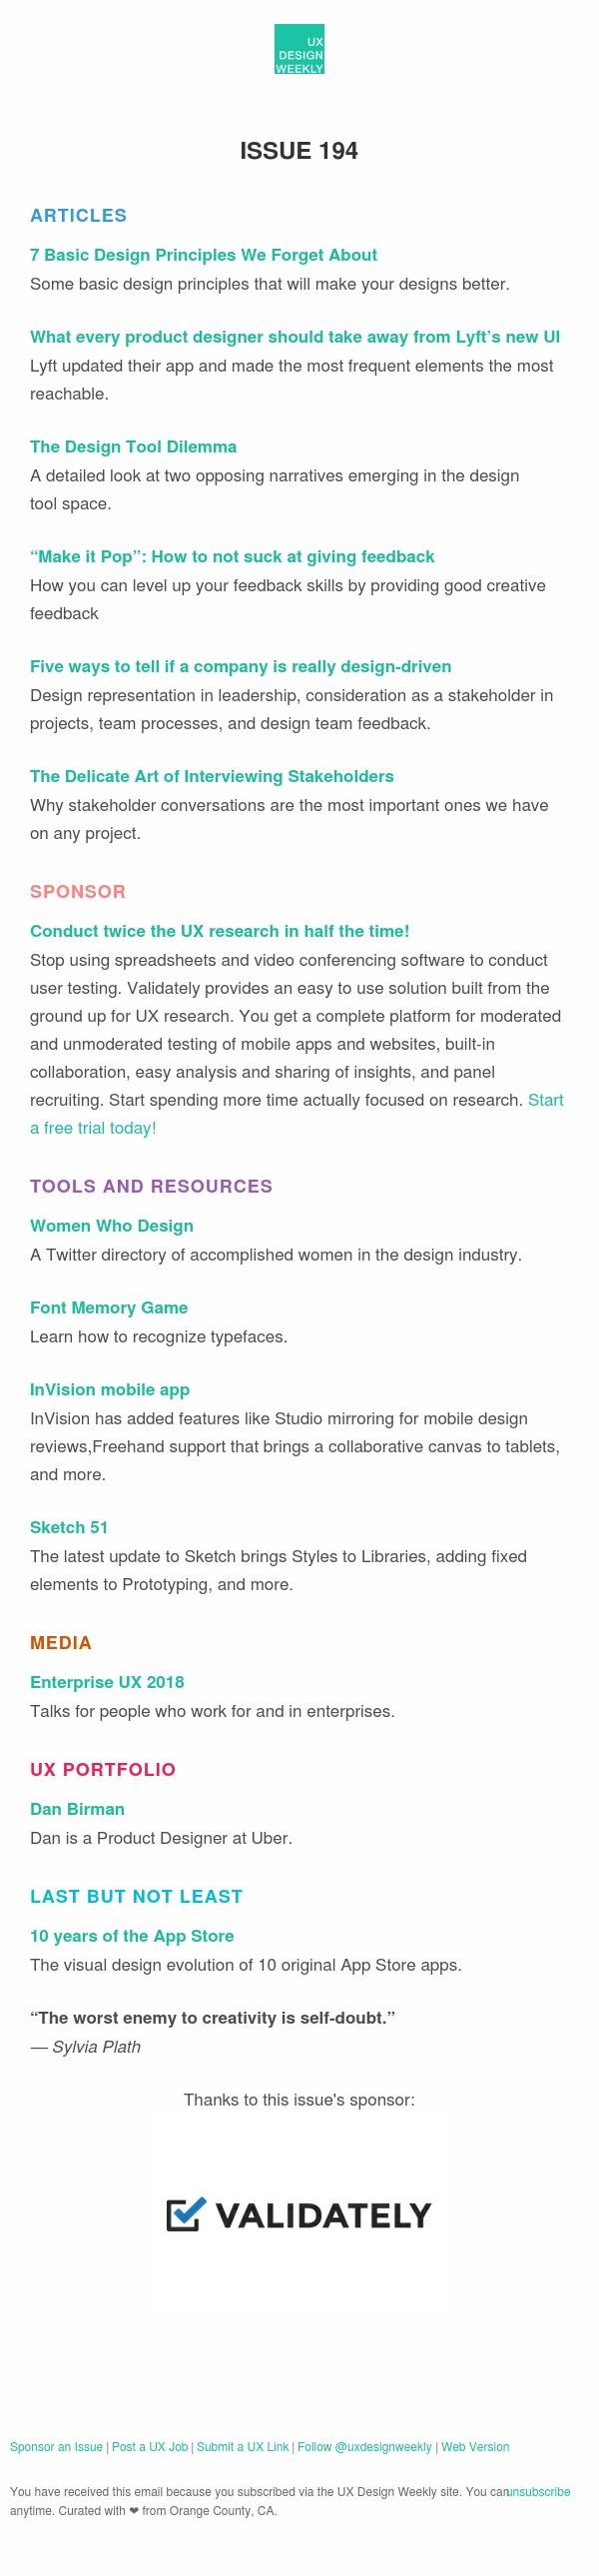 UX Design Weekly: 7 Basic Design Principles, Lyft's New UI, Design Tool Dilemma